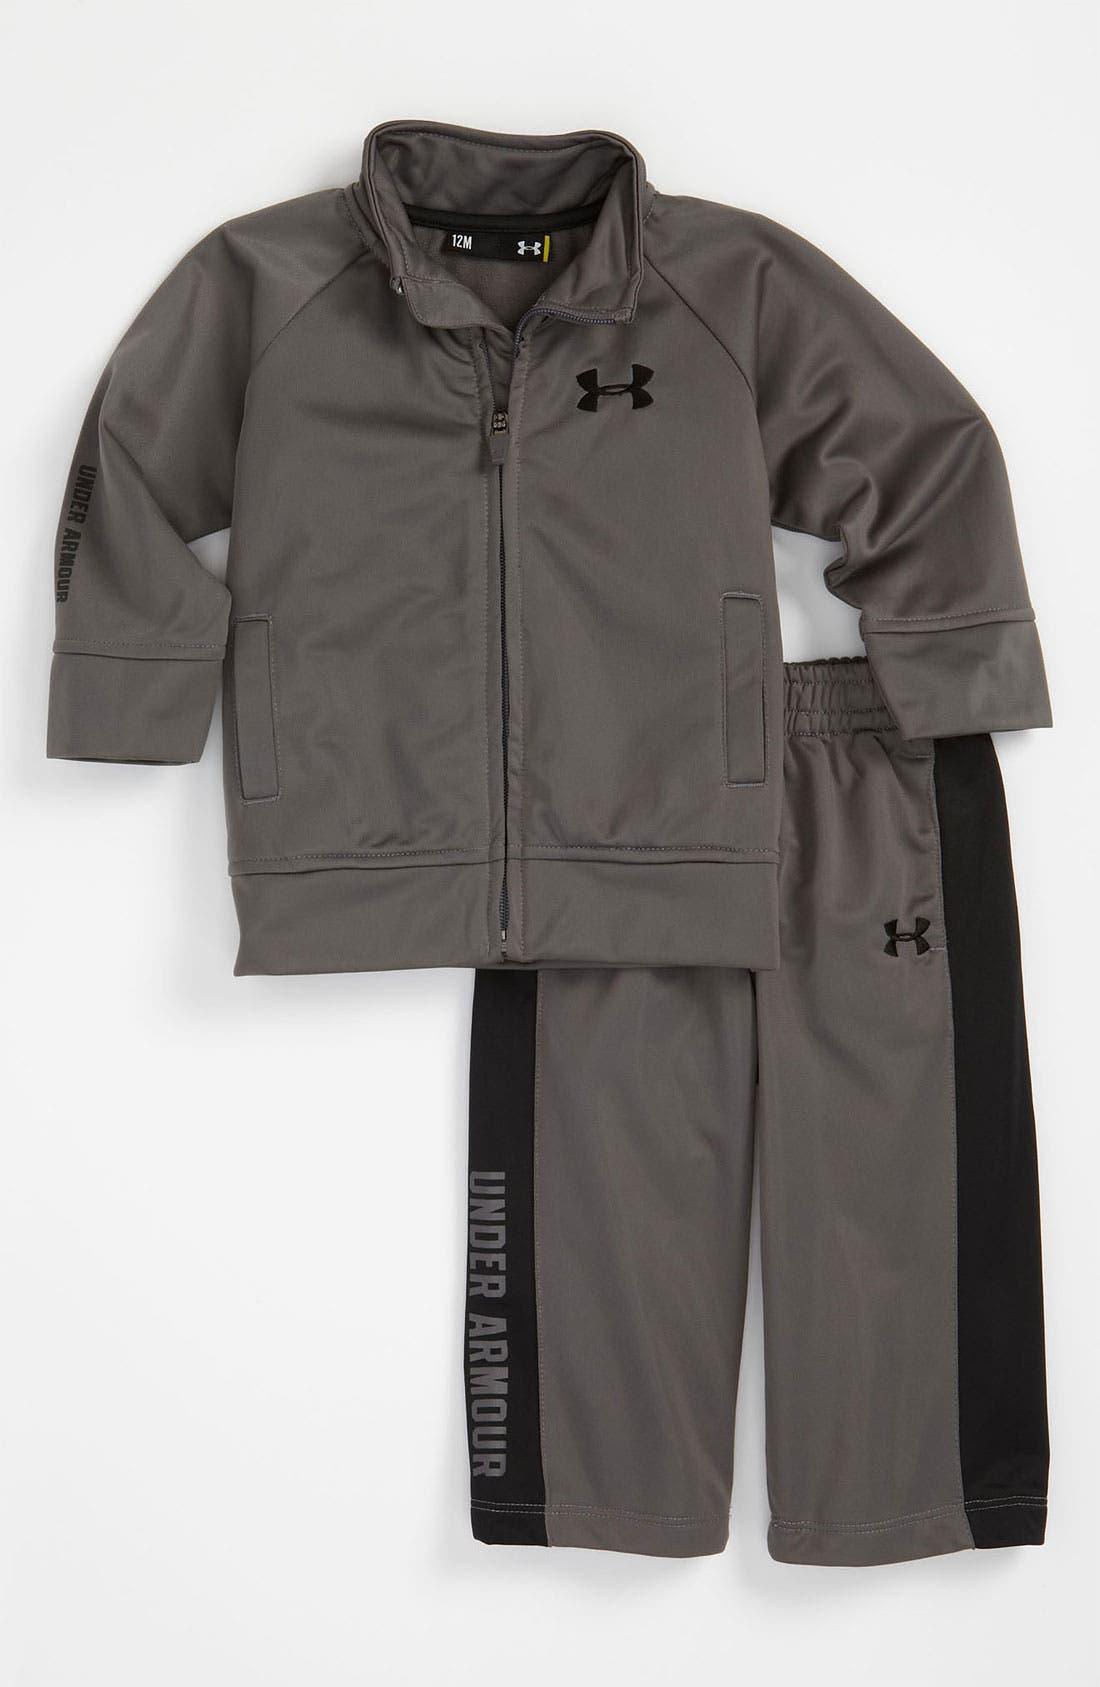 Alternate Image 1 Selected - Under Armour Jacket & Pants (Infant)